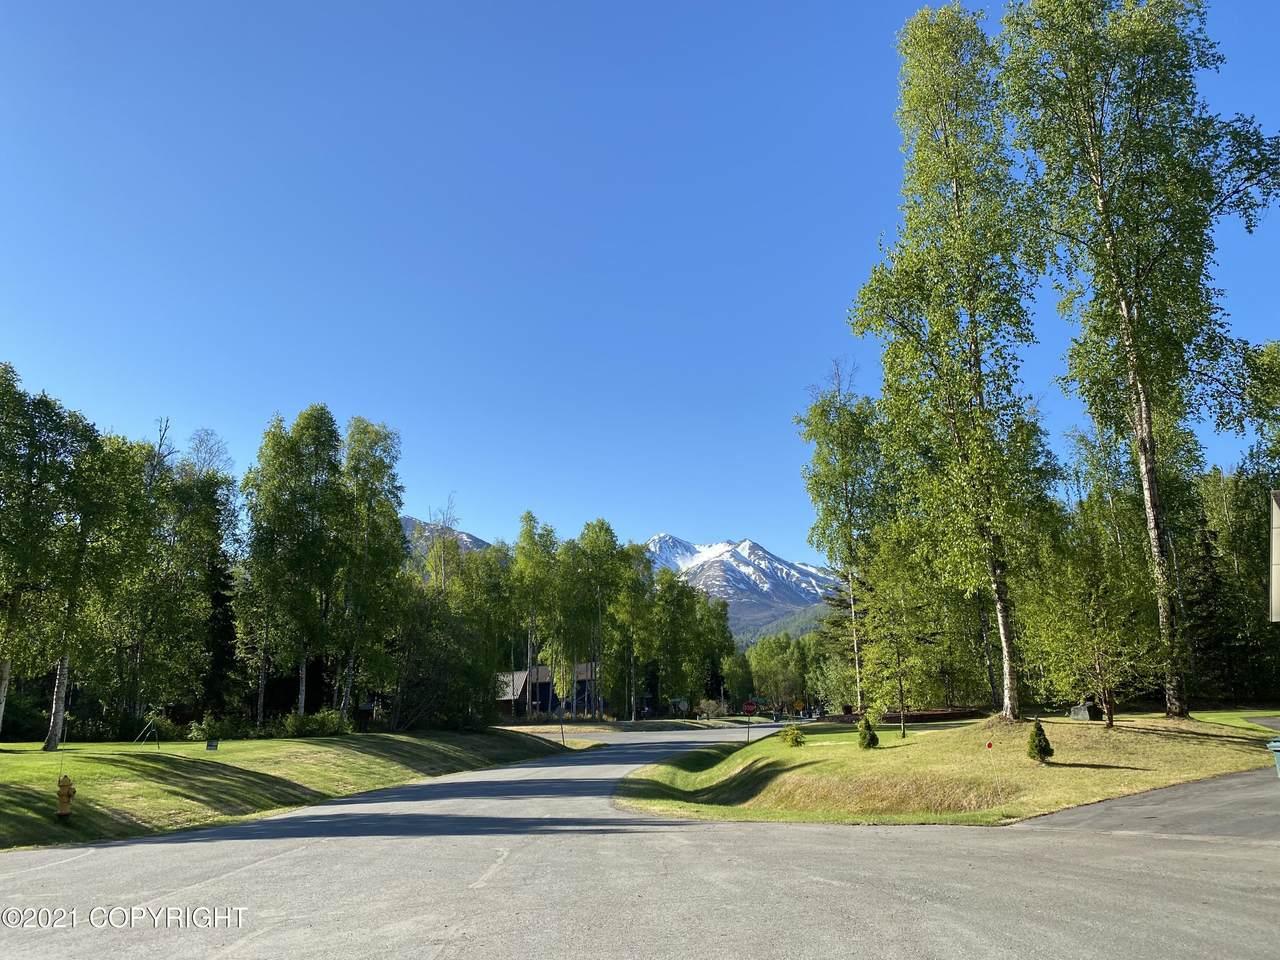 https://bt-photos.global.ssl.fastly.net/alaska/1280_boomver_2_21-9656-2.jpg